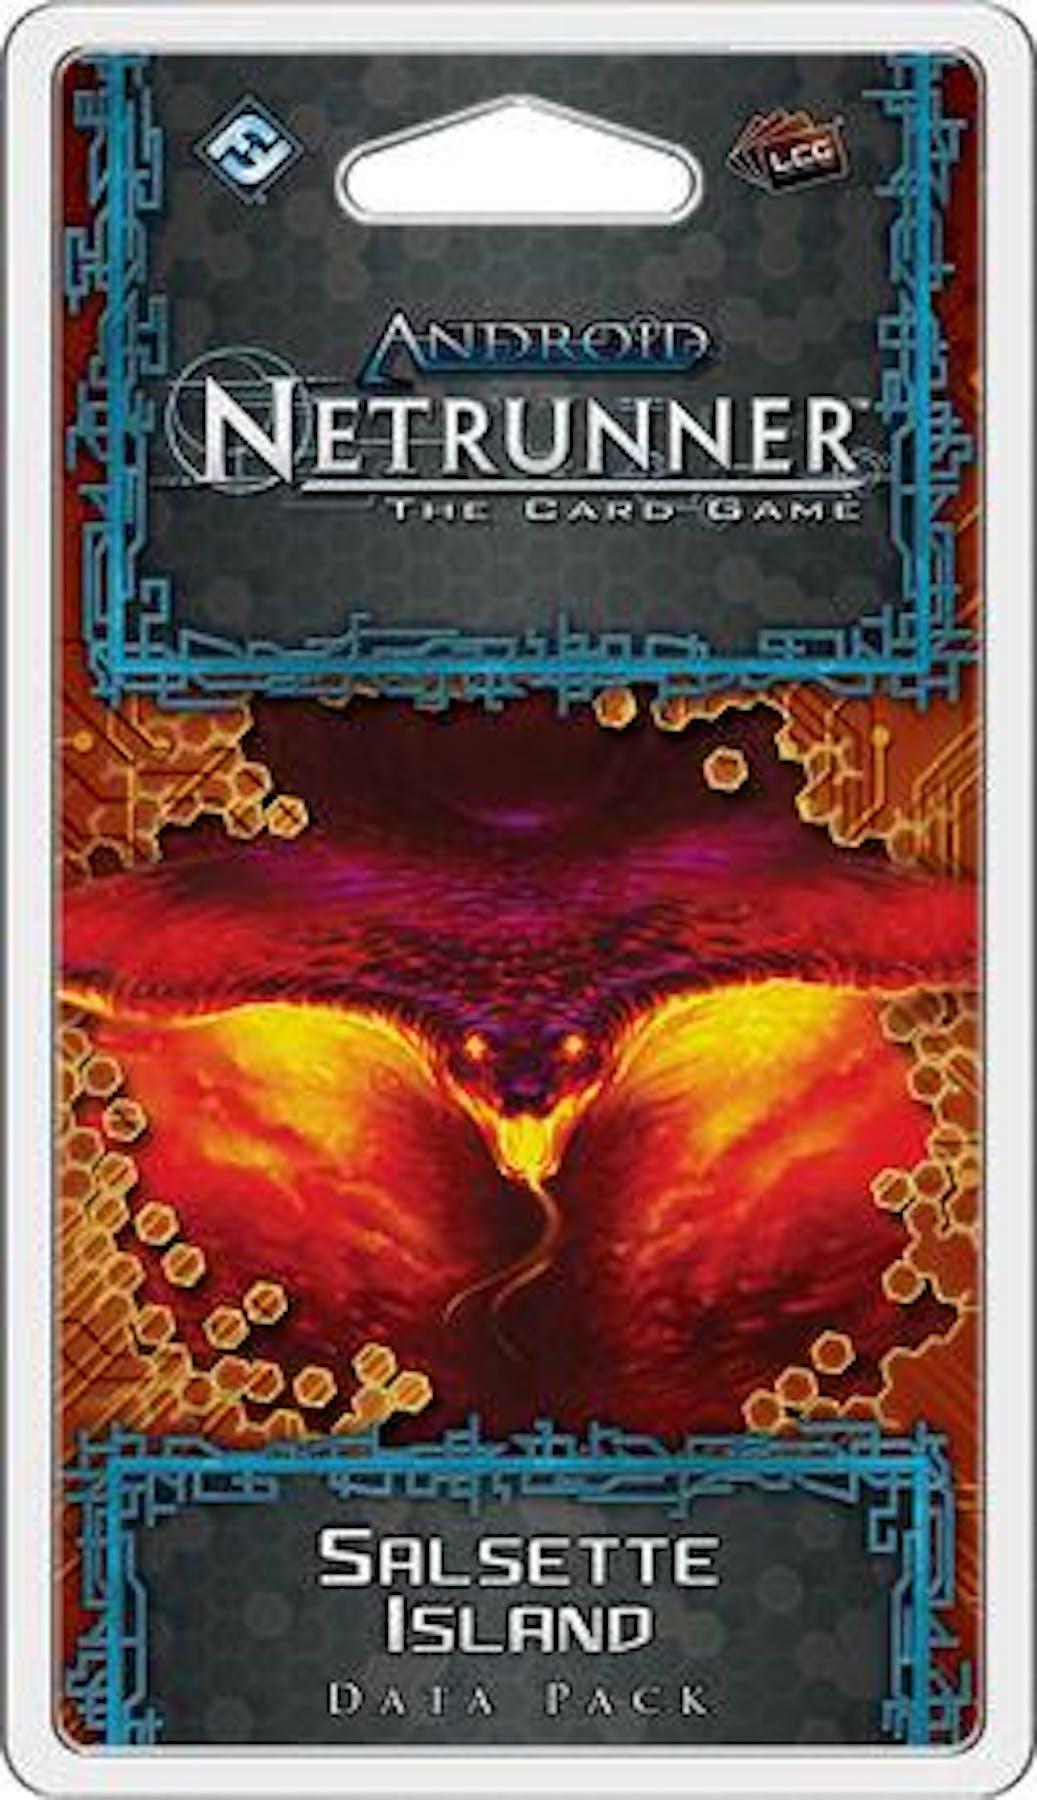 Android: Netrunner (Original Core Set) - thebrokentoken.com